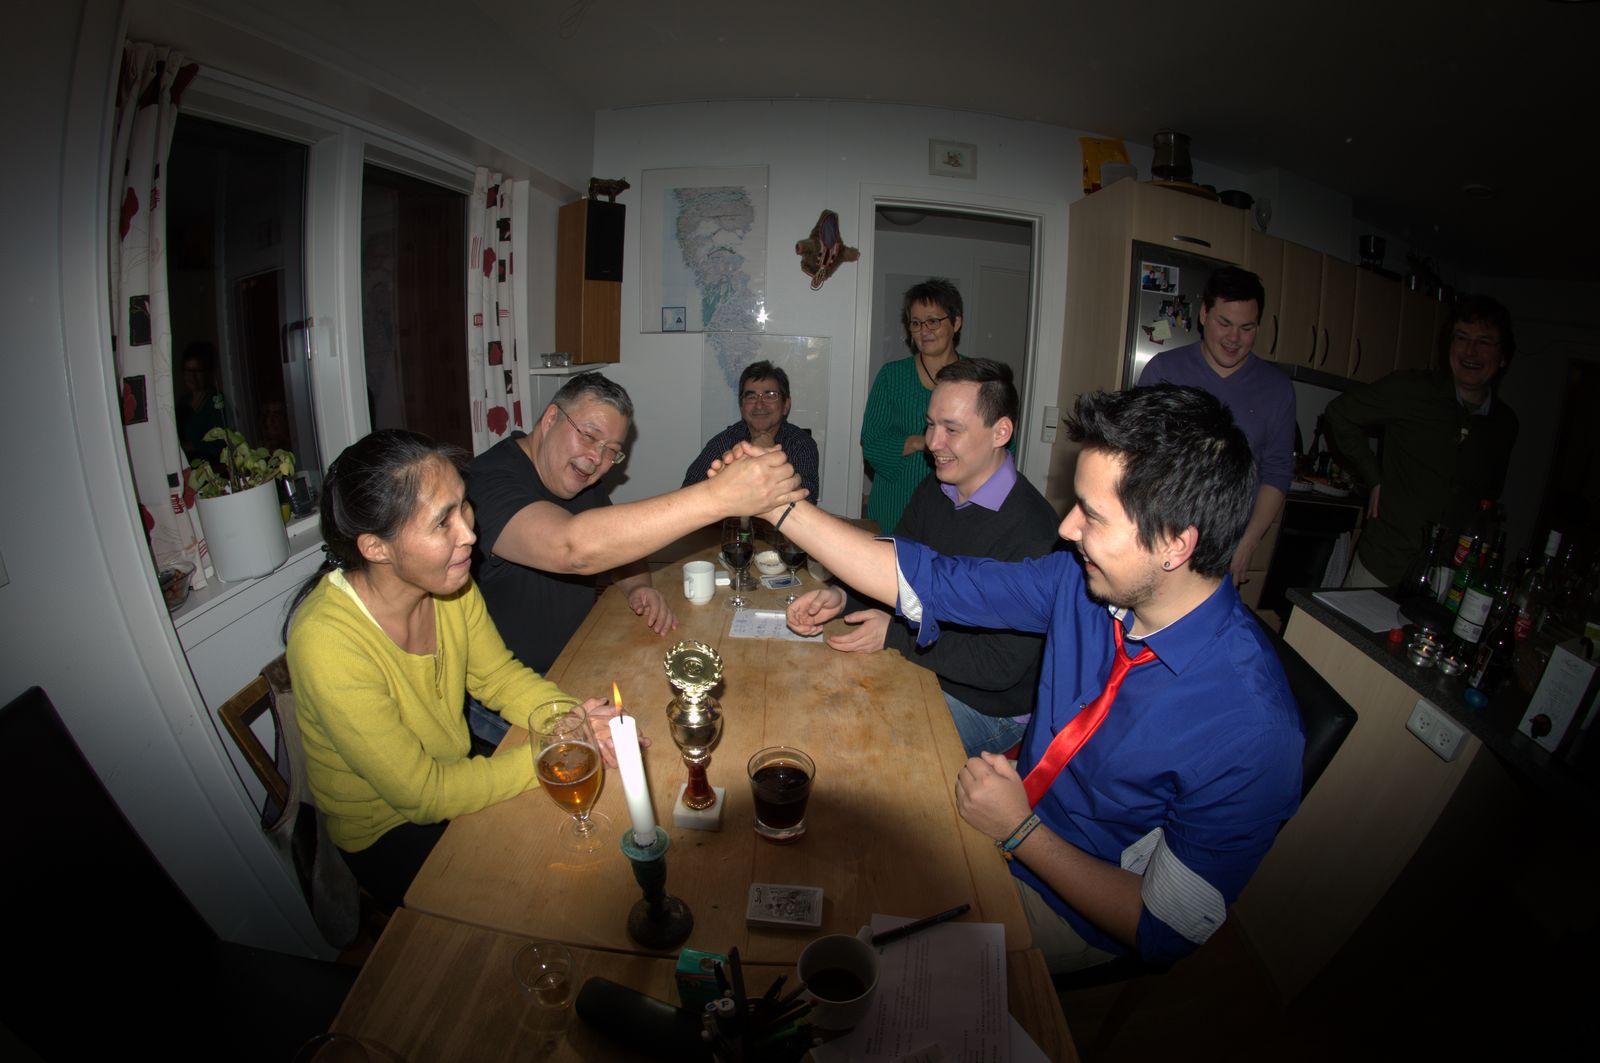 2013-12-28-0008_-_frederik_labansen_jakobine_labansen_martin_labansen_per_andersen_simon_moqqu_loevstroem_soeren_2